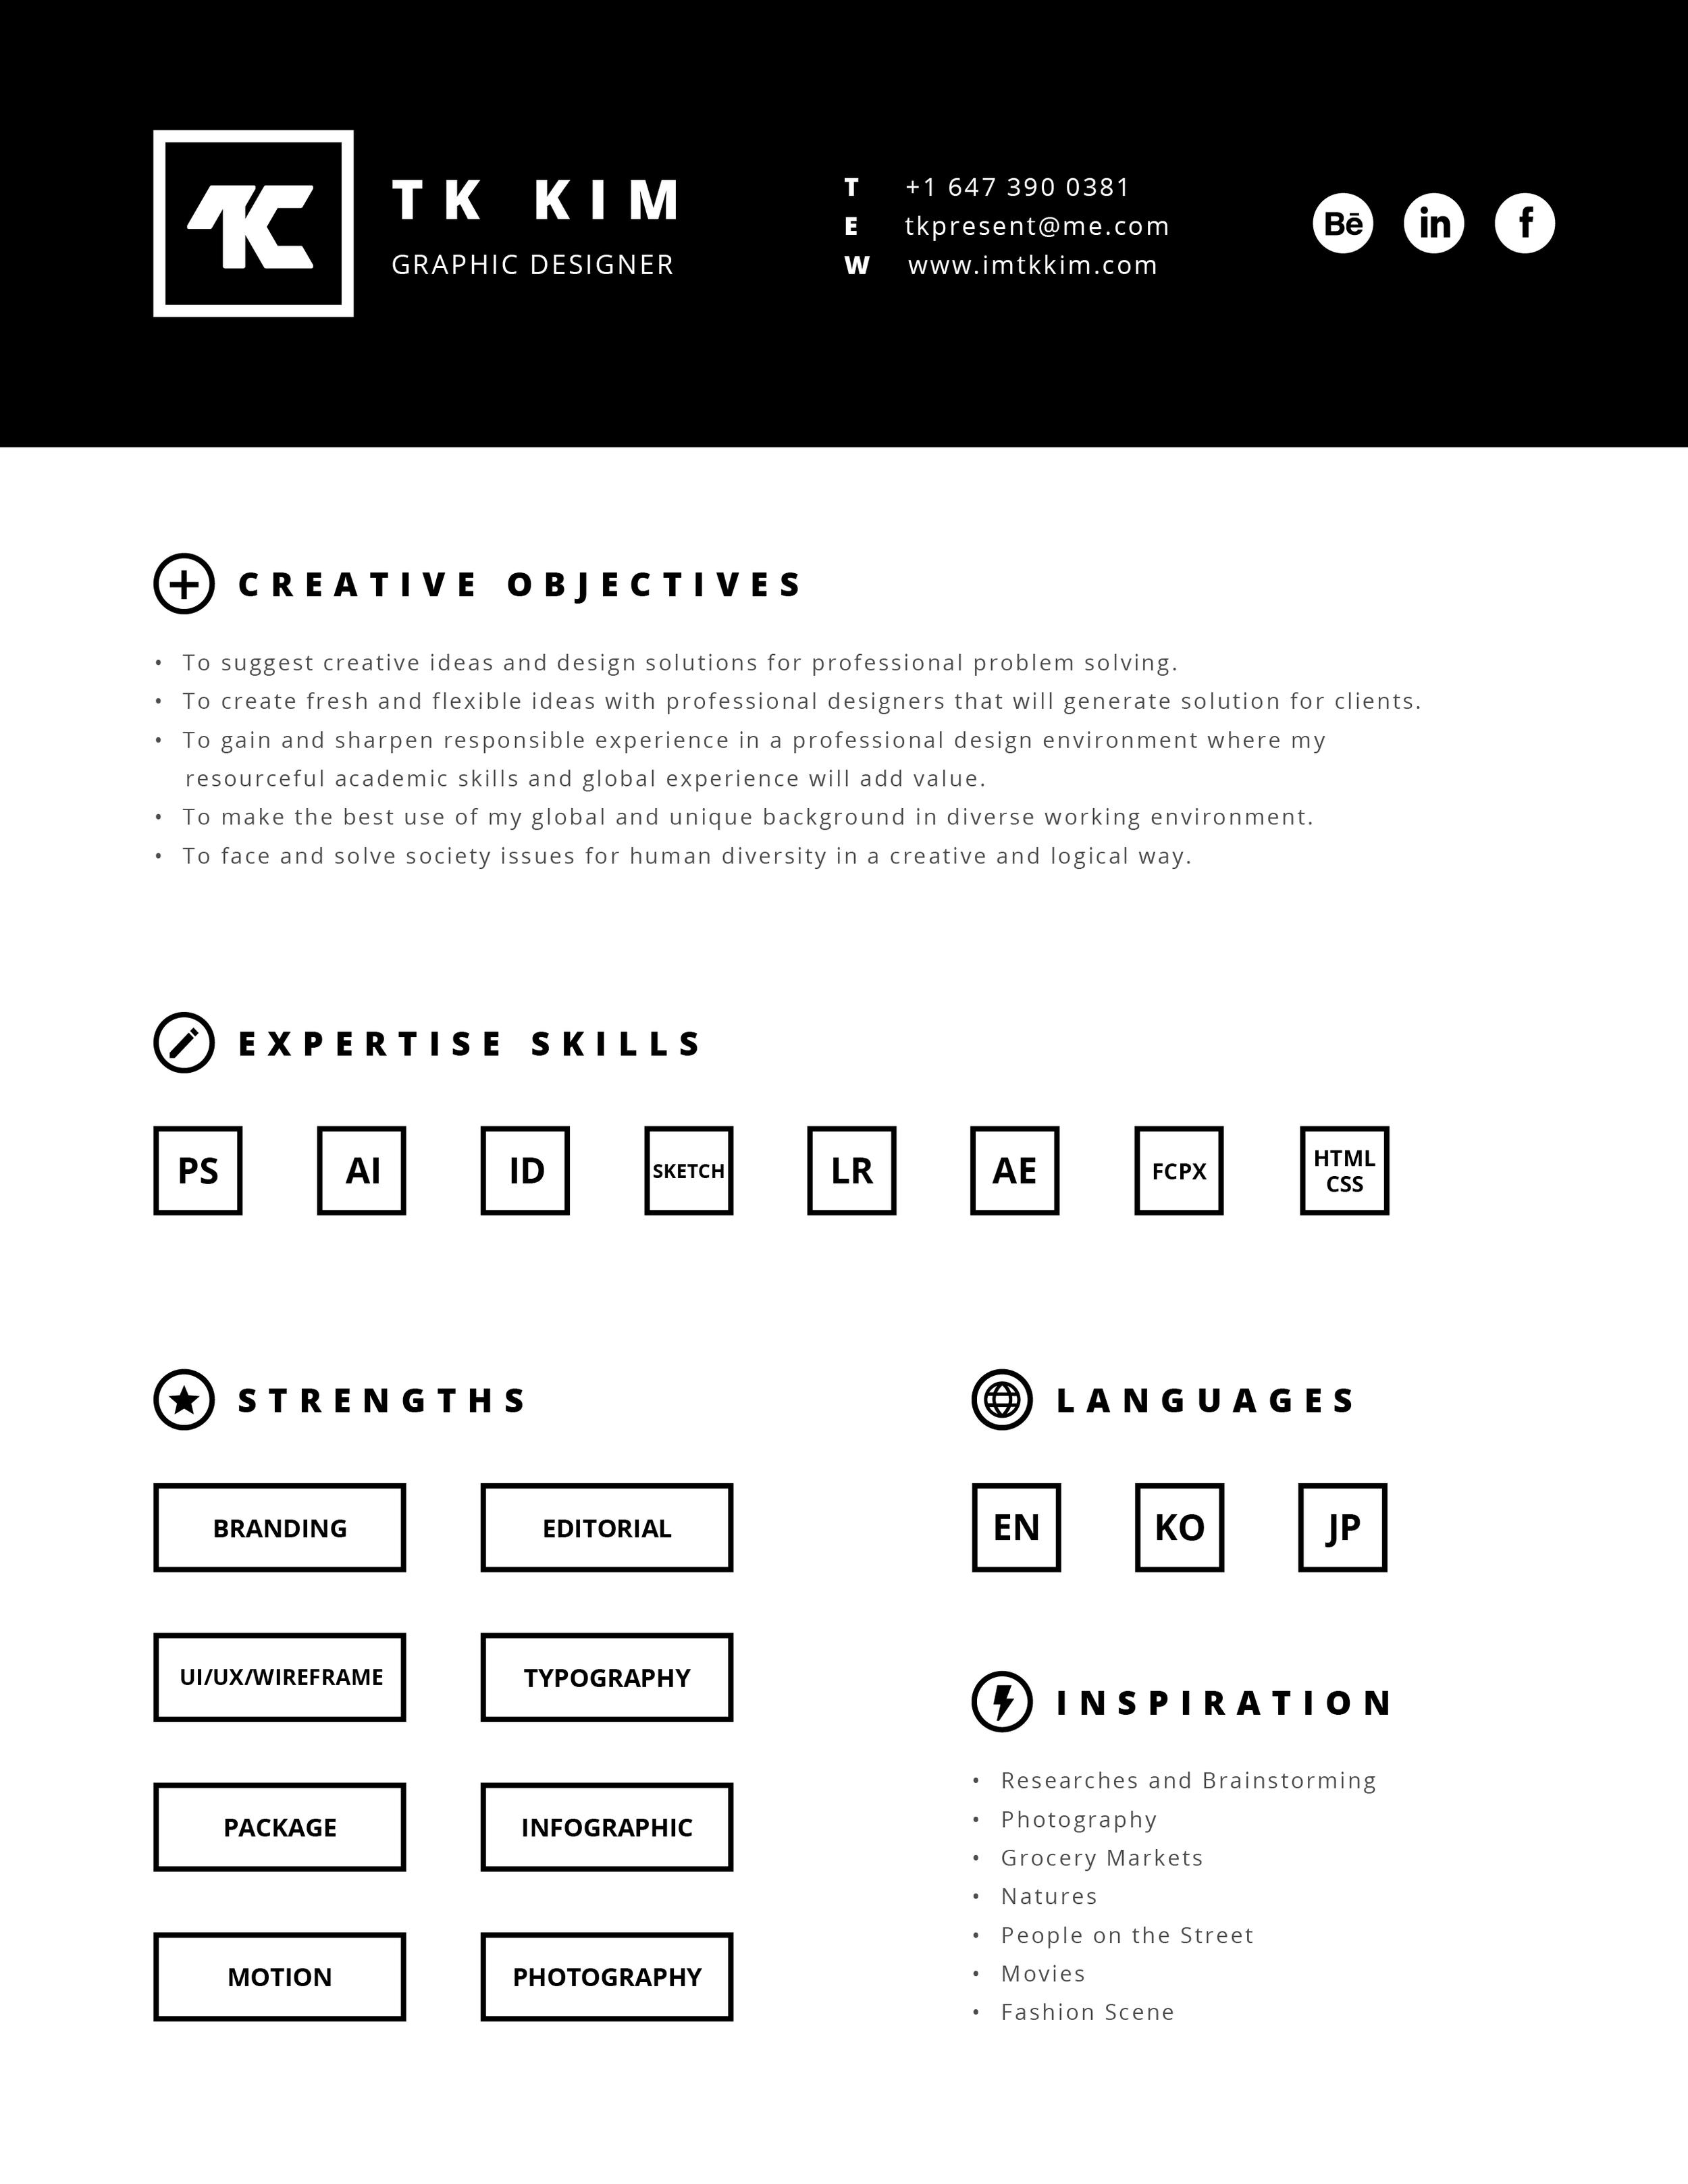 infographic_resume_20170712.jpg